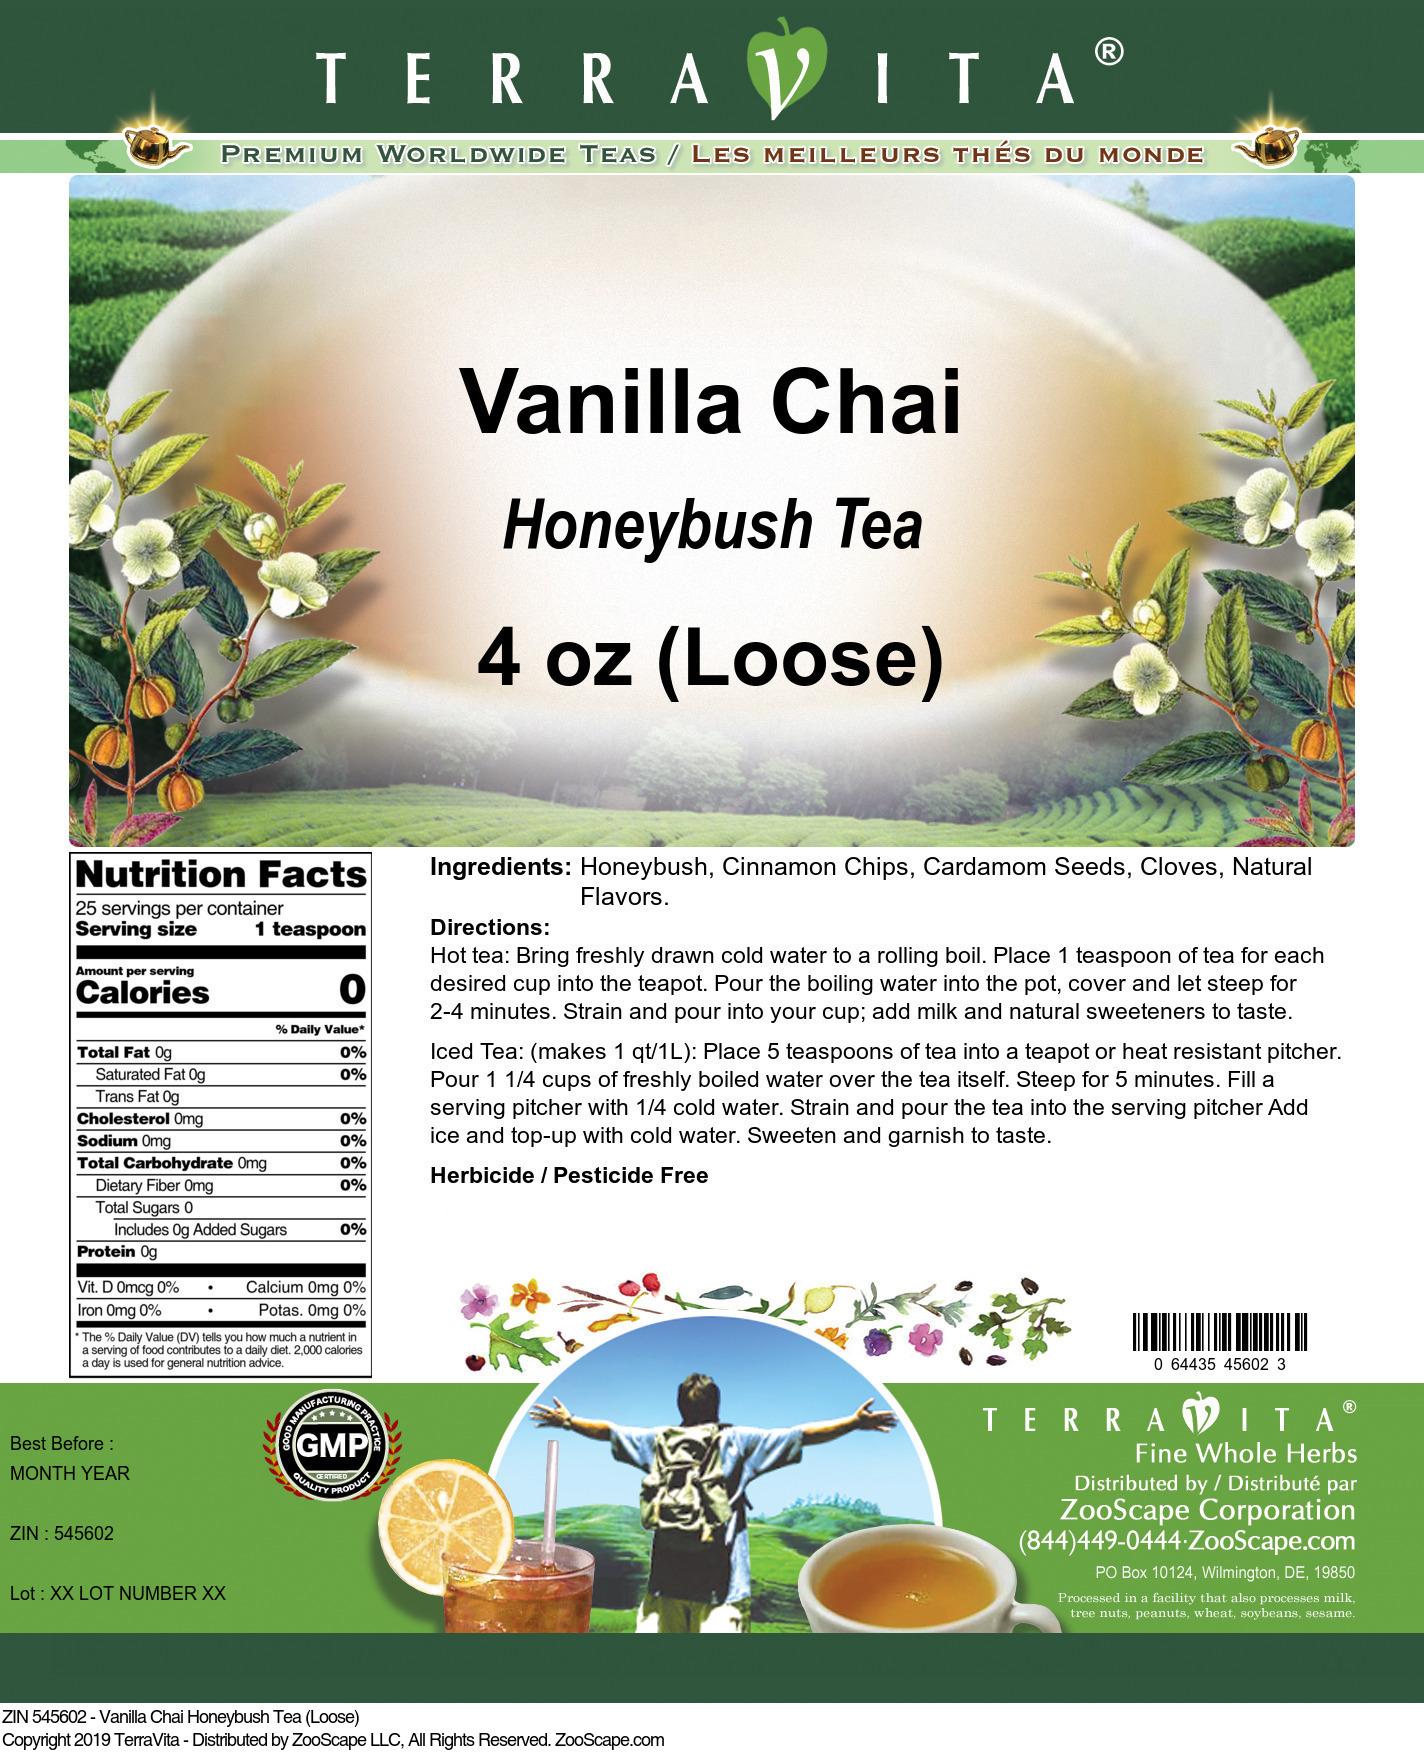 Vanilla Chai Honeybush Tea